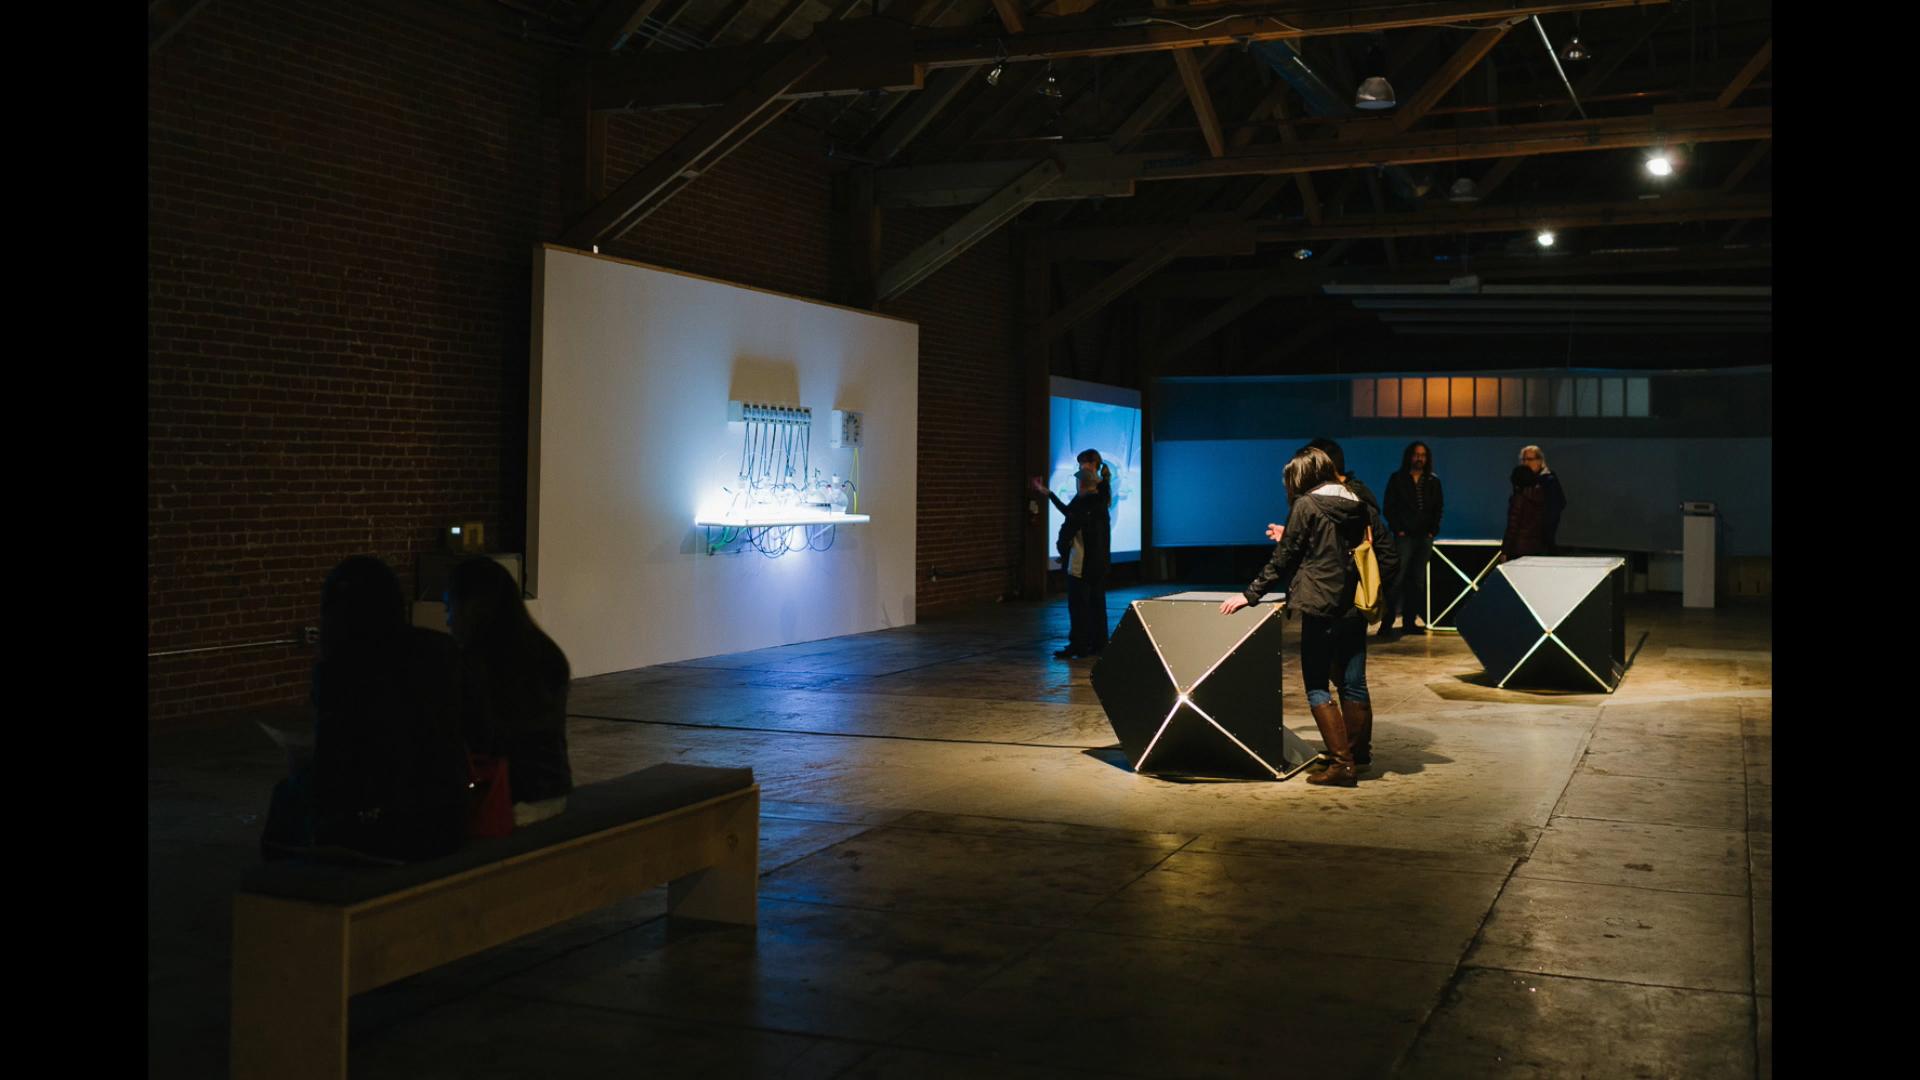 ©ISEA2015: 21st International Symposium on Electronic Art, Adam Brown, ReBioGeneSys: Origins of Life